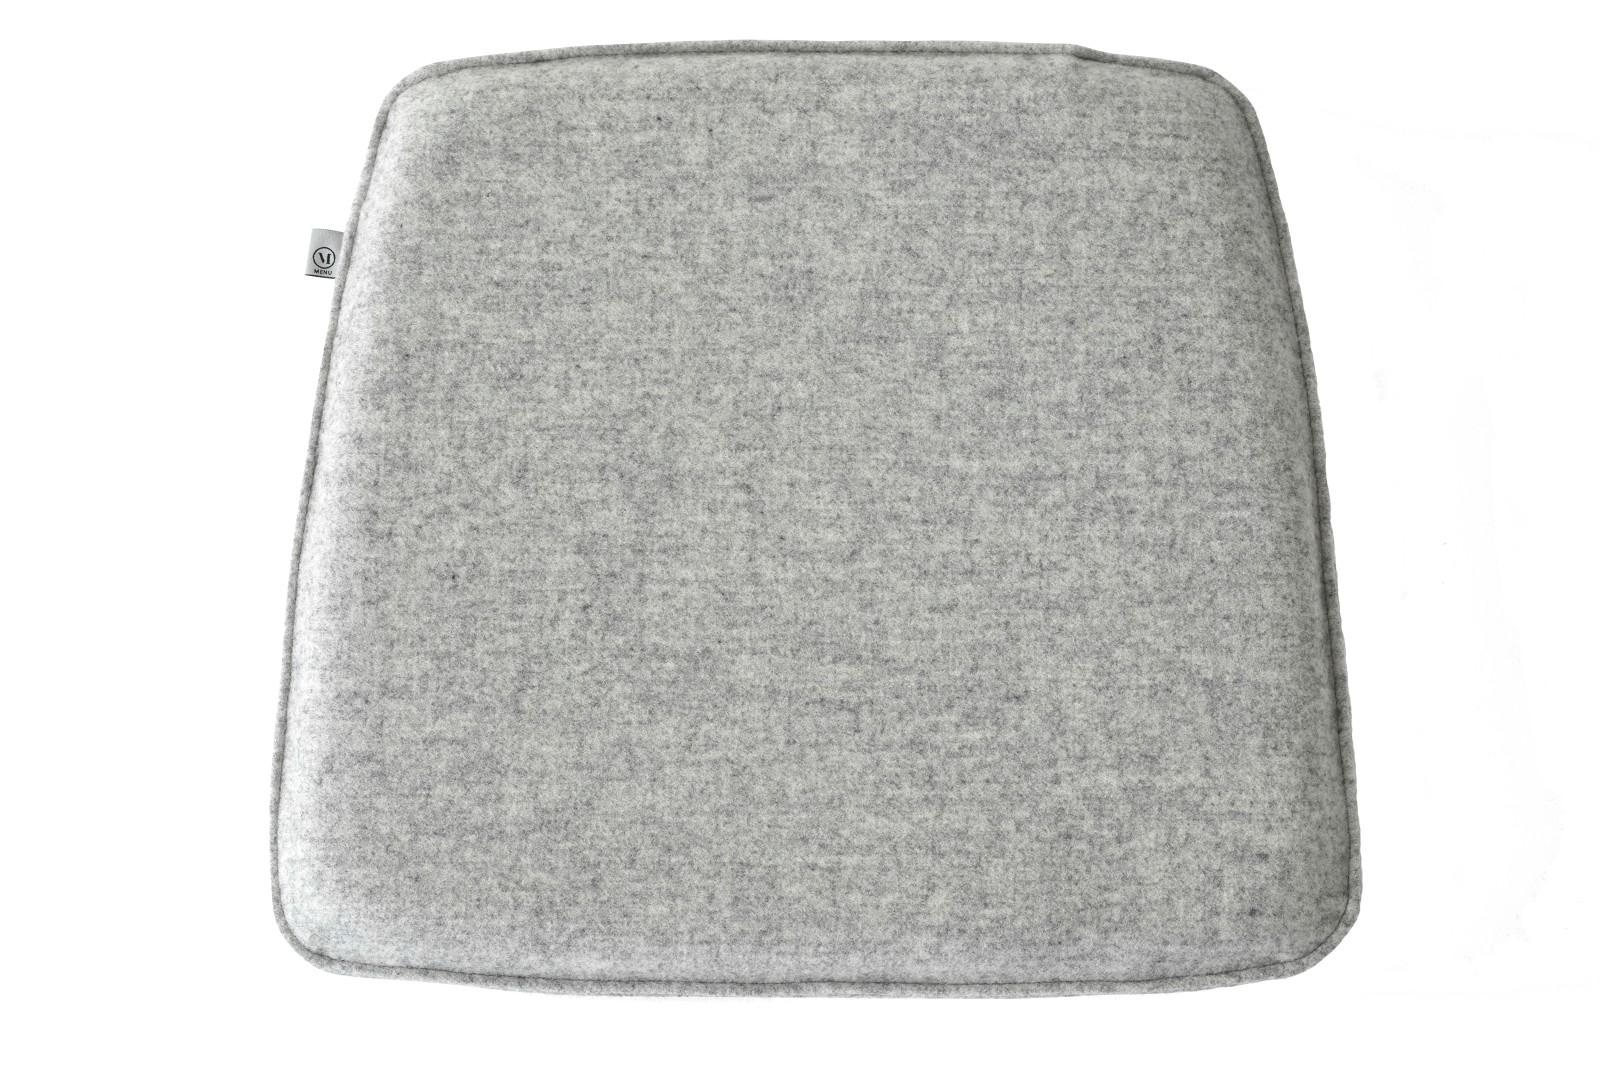 WM String Indoor Cushion Luna 2 Colour 04013, 38.5x35